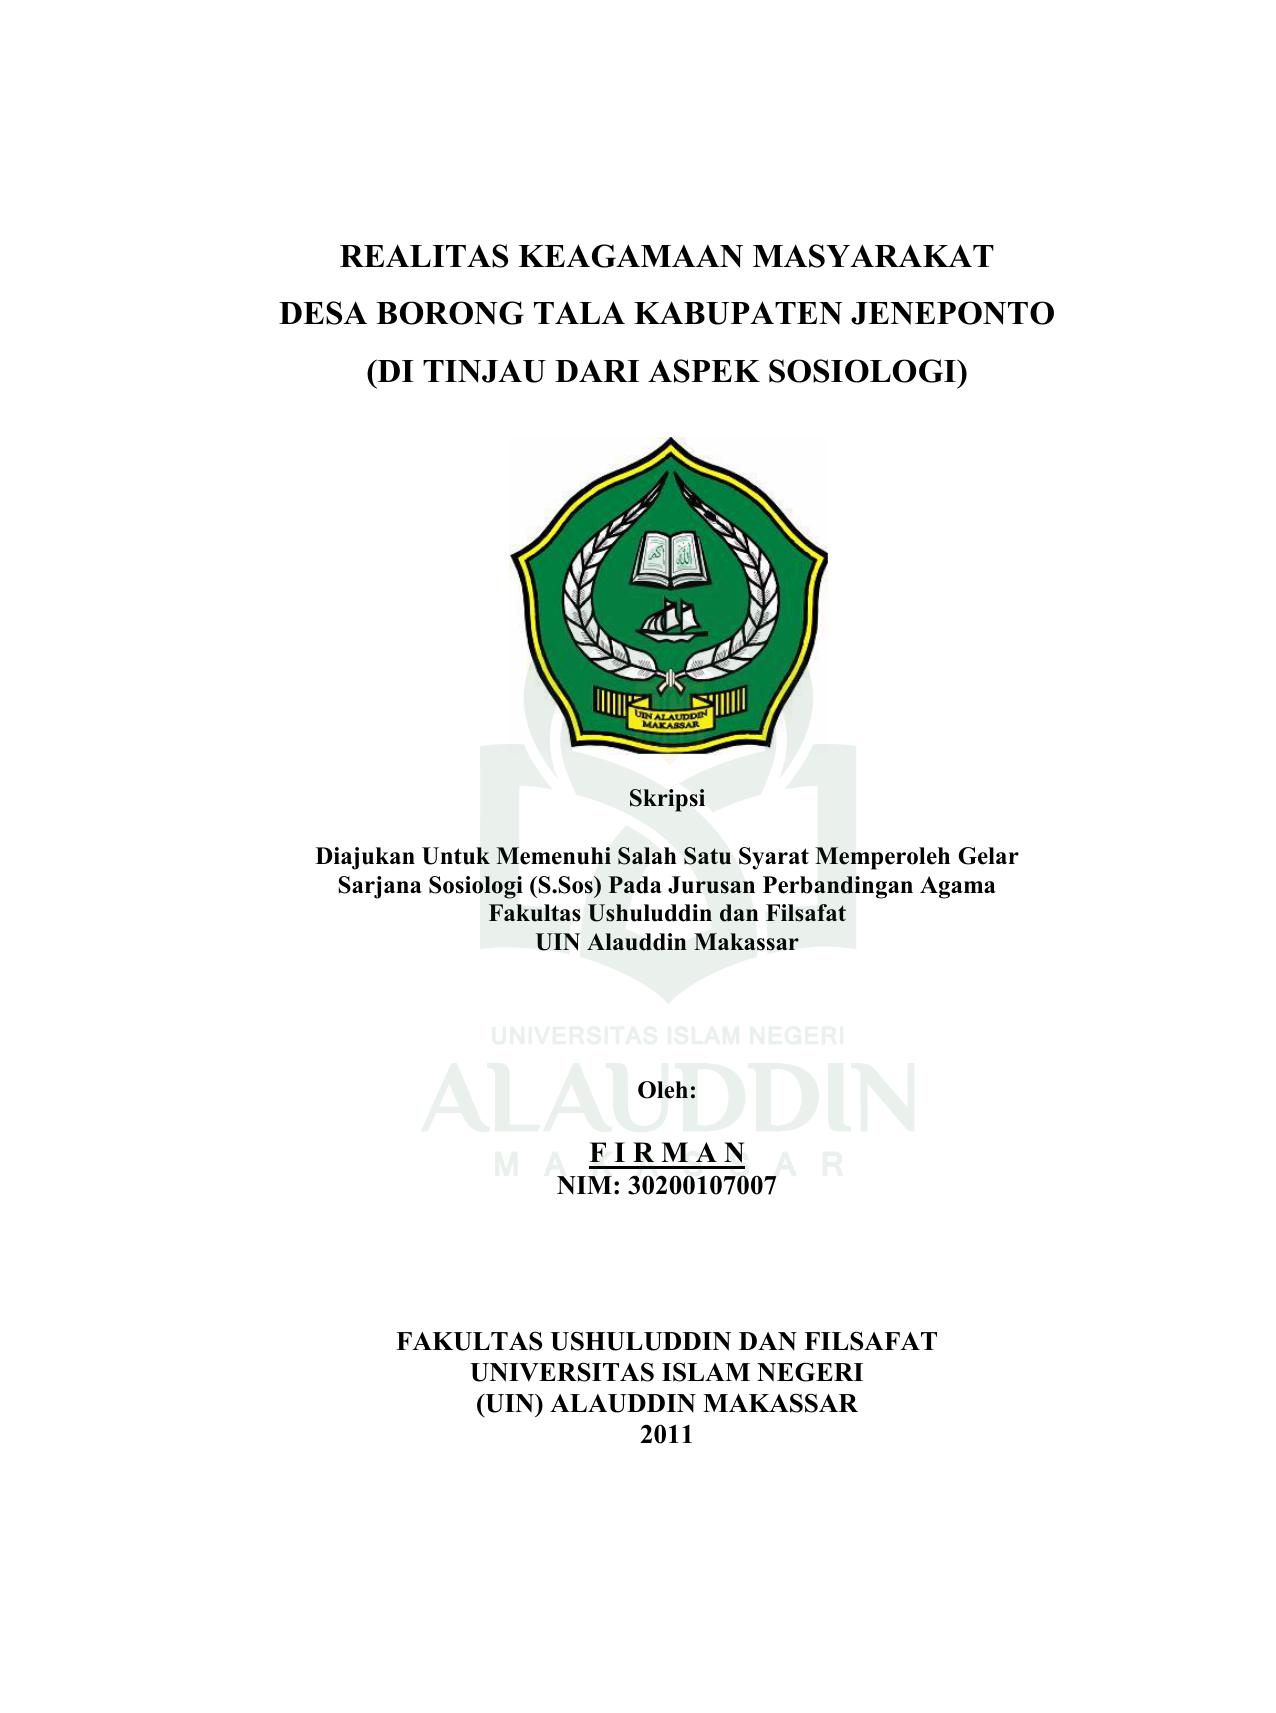 Realitas Keagamaan Masyarakat Desa Borong Tala Kabupaten